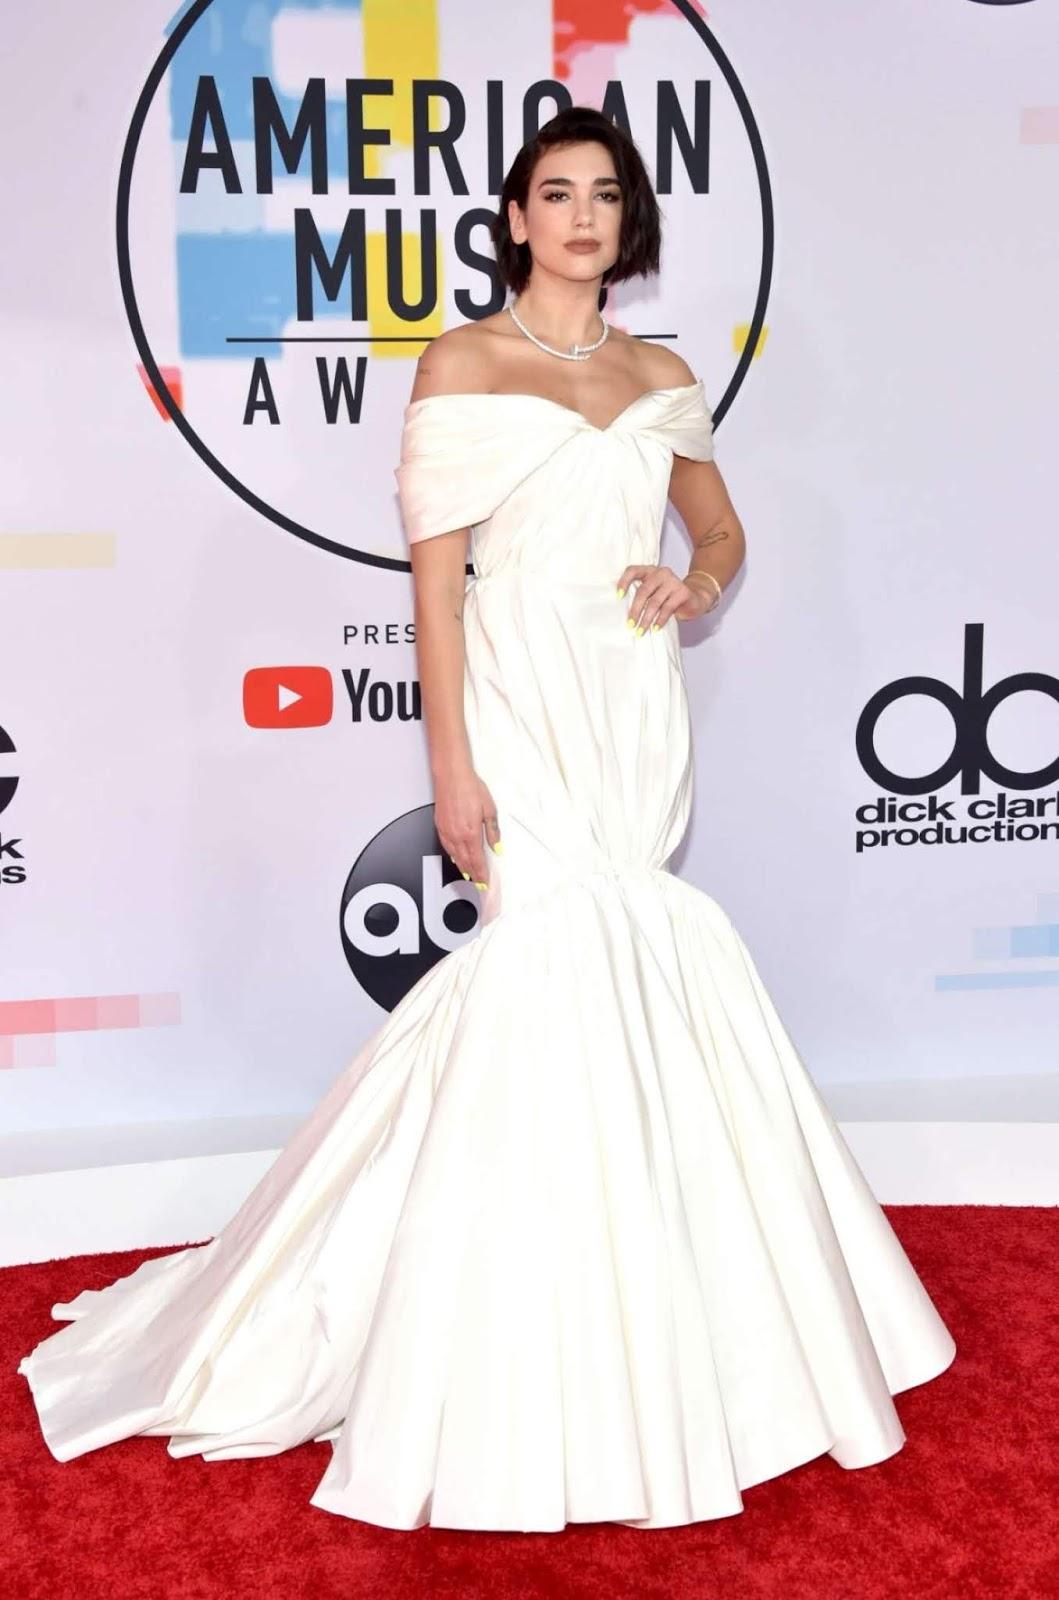 Dua Lipa wears bridal white to the 2018 American Music Awards